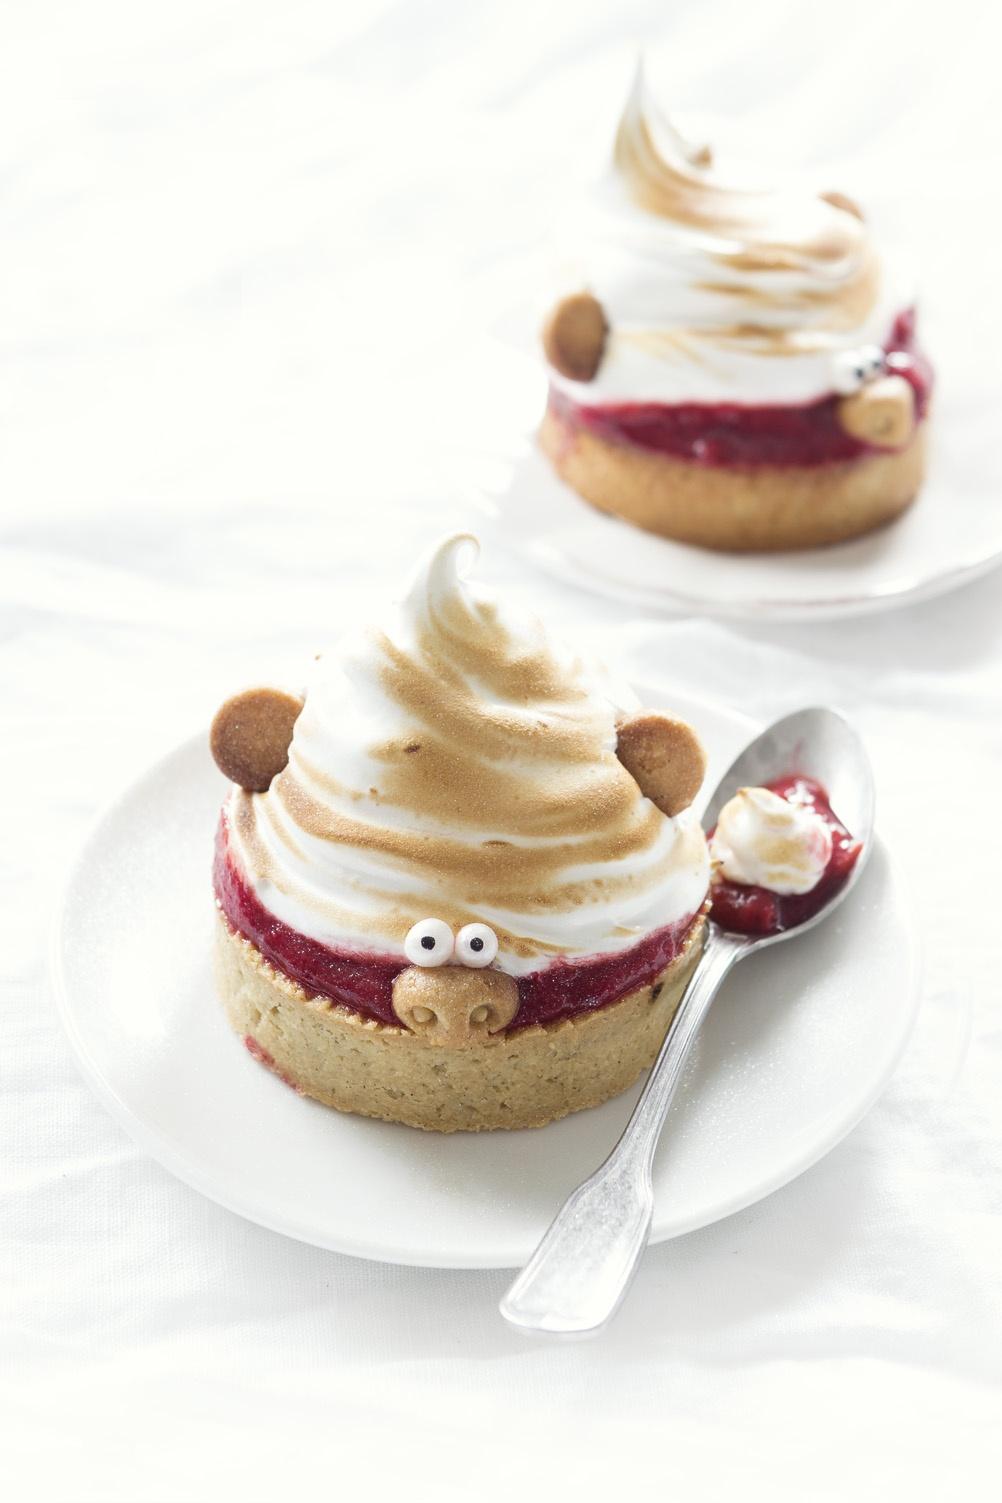 Troll pie - tarte fraise rhubarbe meringue - Studio de creation - Qui a vole les tartes (2)